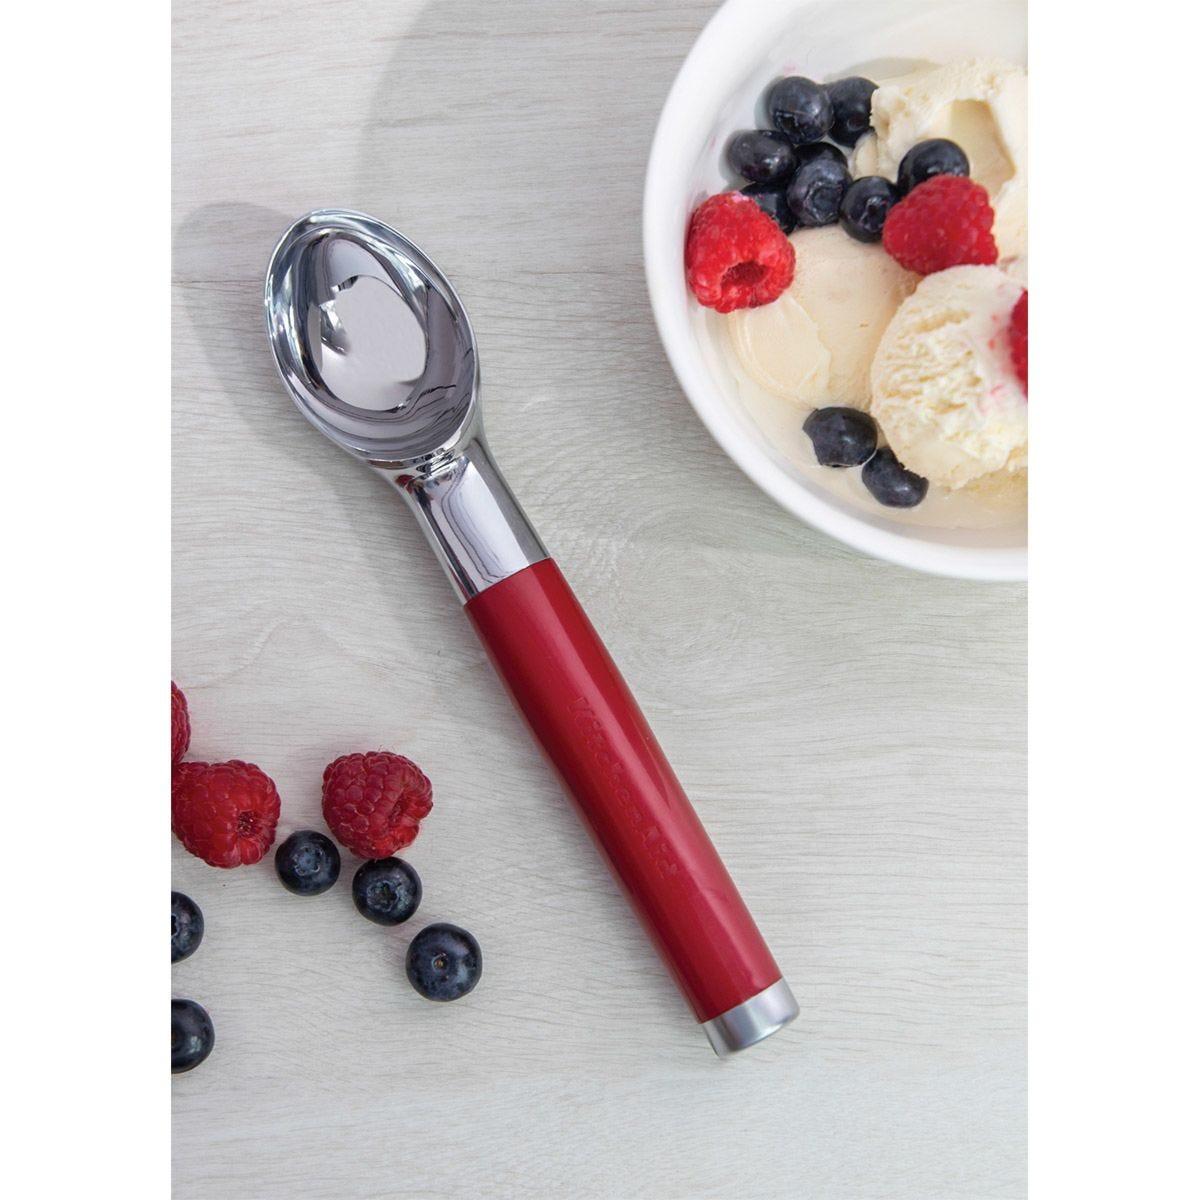 KitchenAid Core Ice Cream Scoop - Red